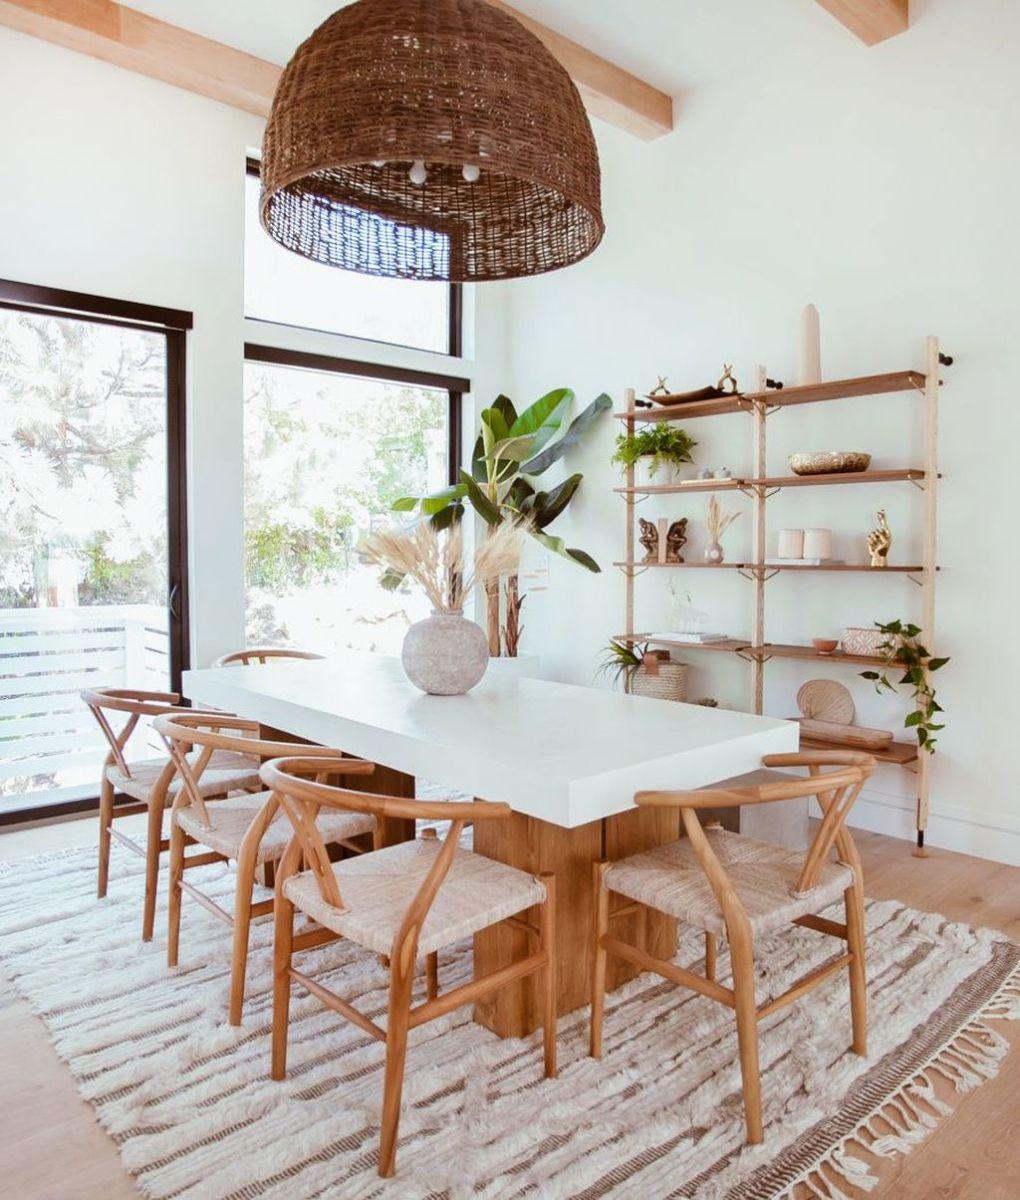 Amazing Morrocan Dining Room Ideas 09 1